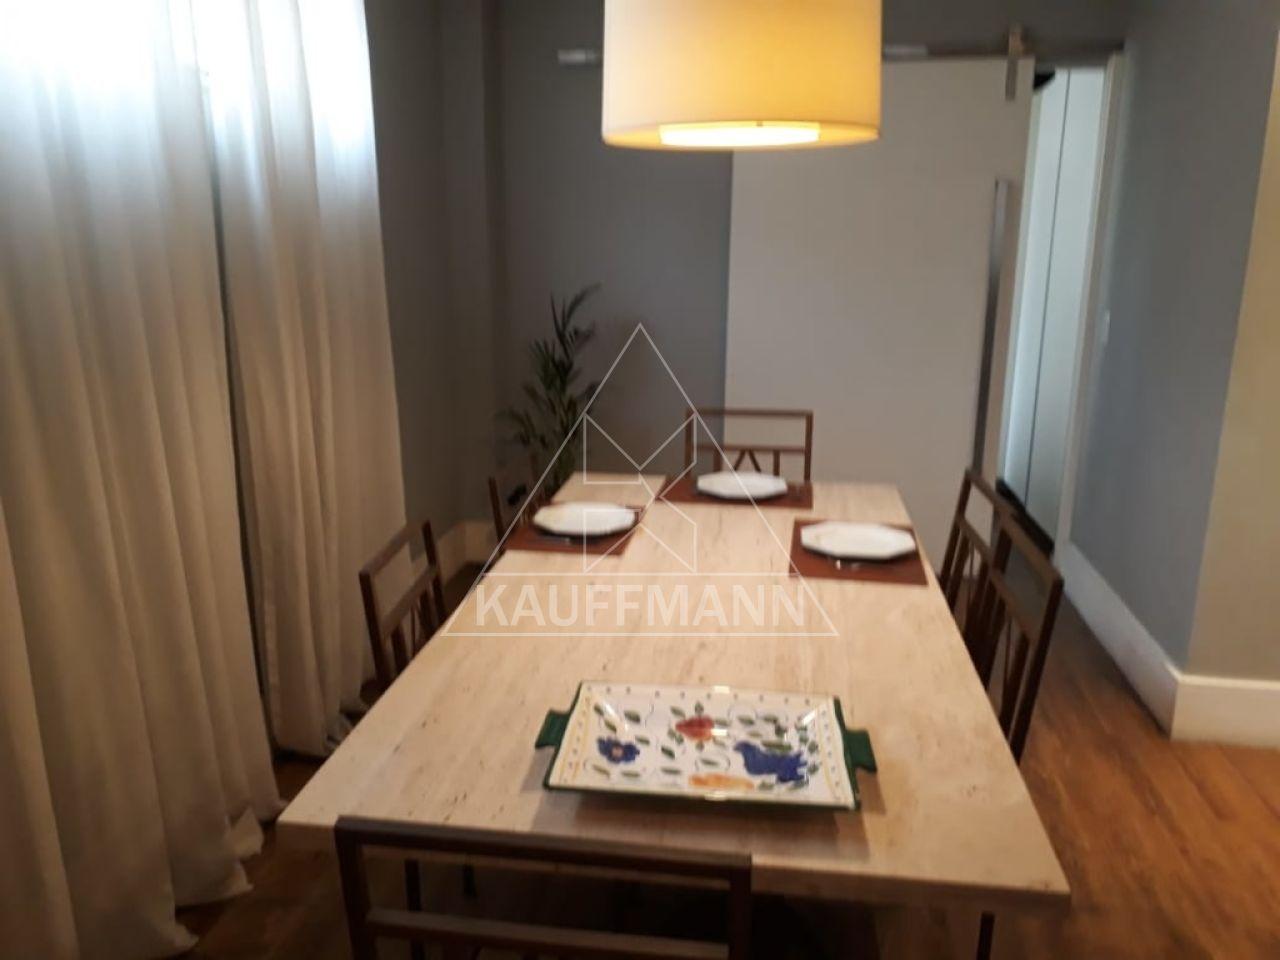 apartamento-venda-sao-paulo-jardim-paulista-3dormitorios-3suites-1vaga-174m2-Foto43